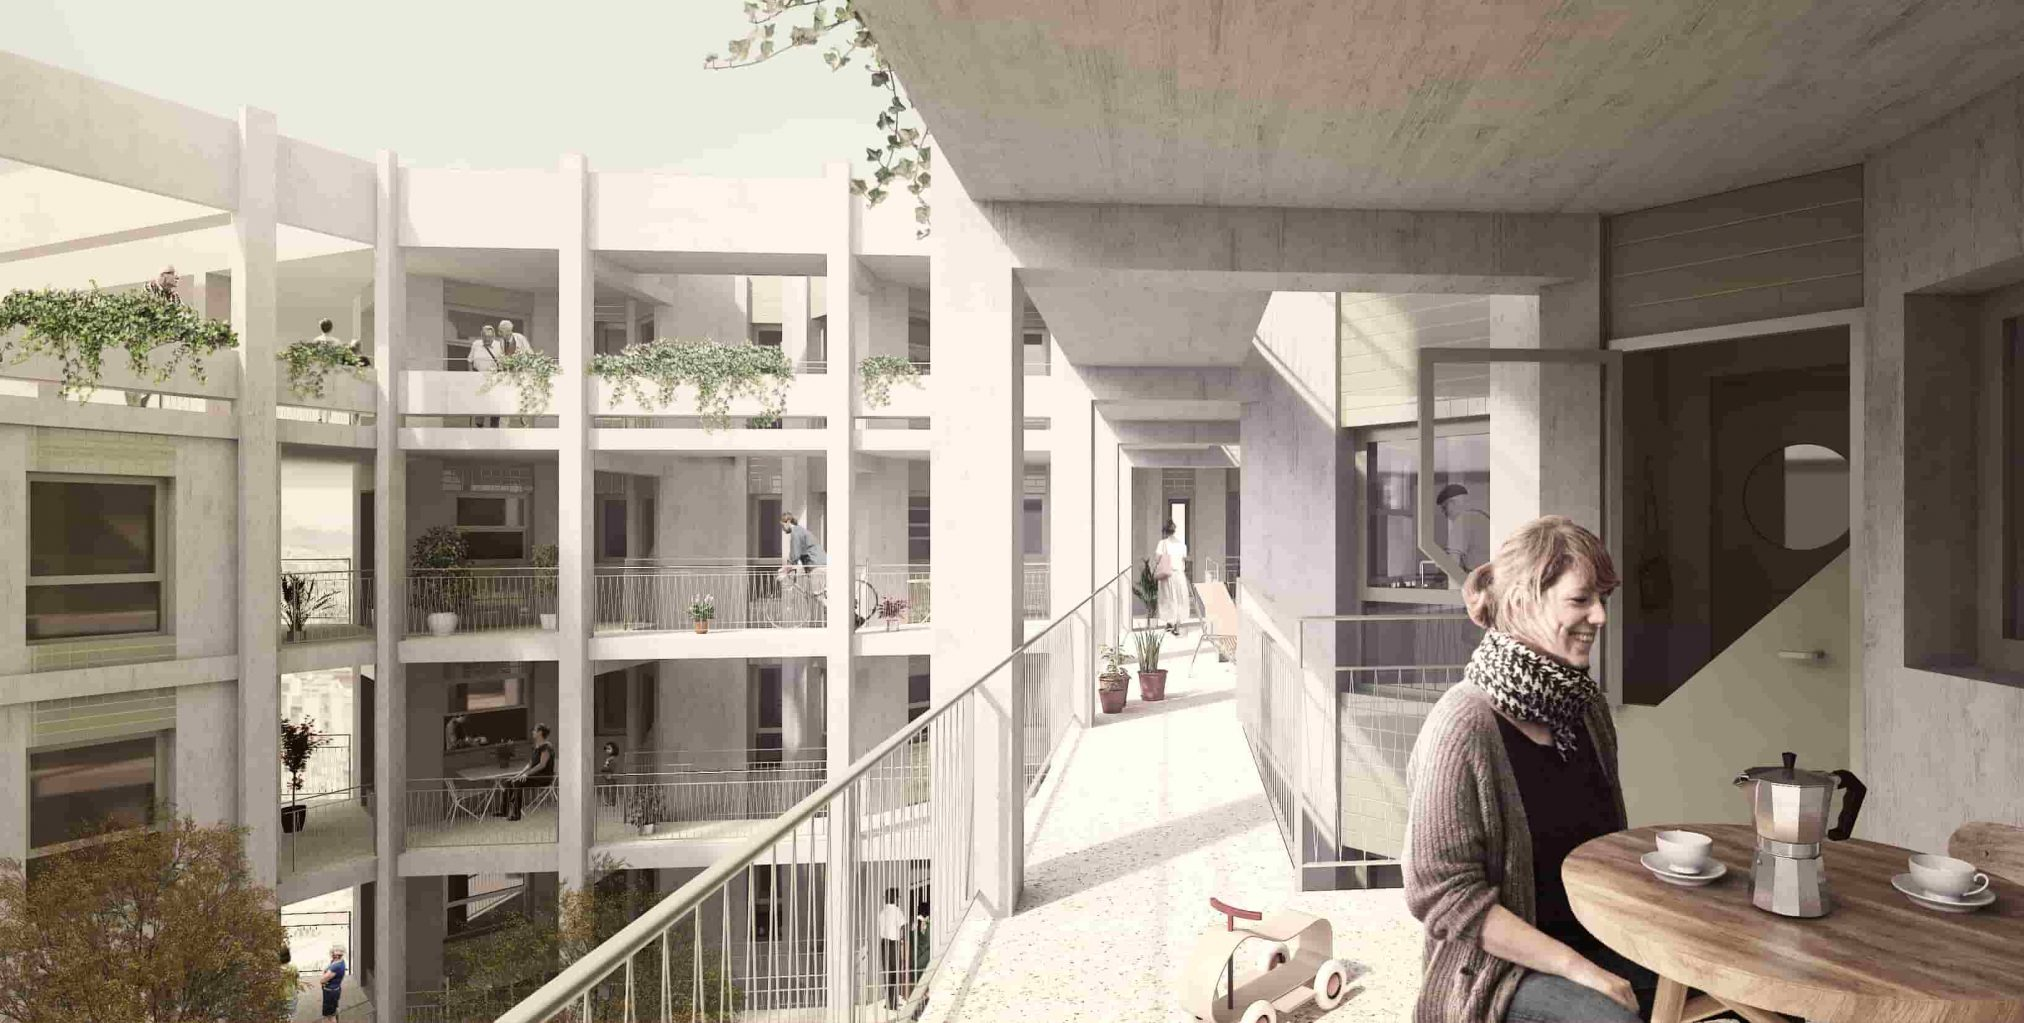 viviendas-sociales-innovacion